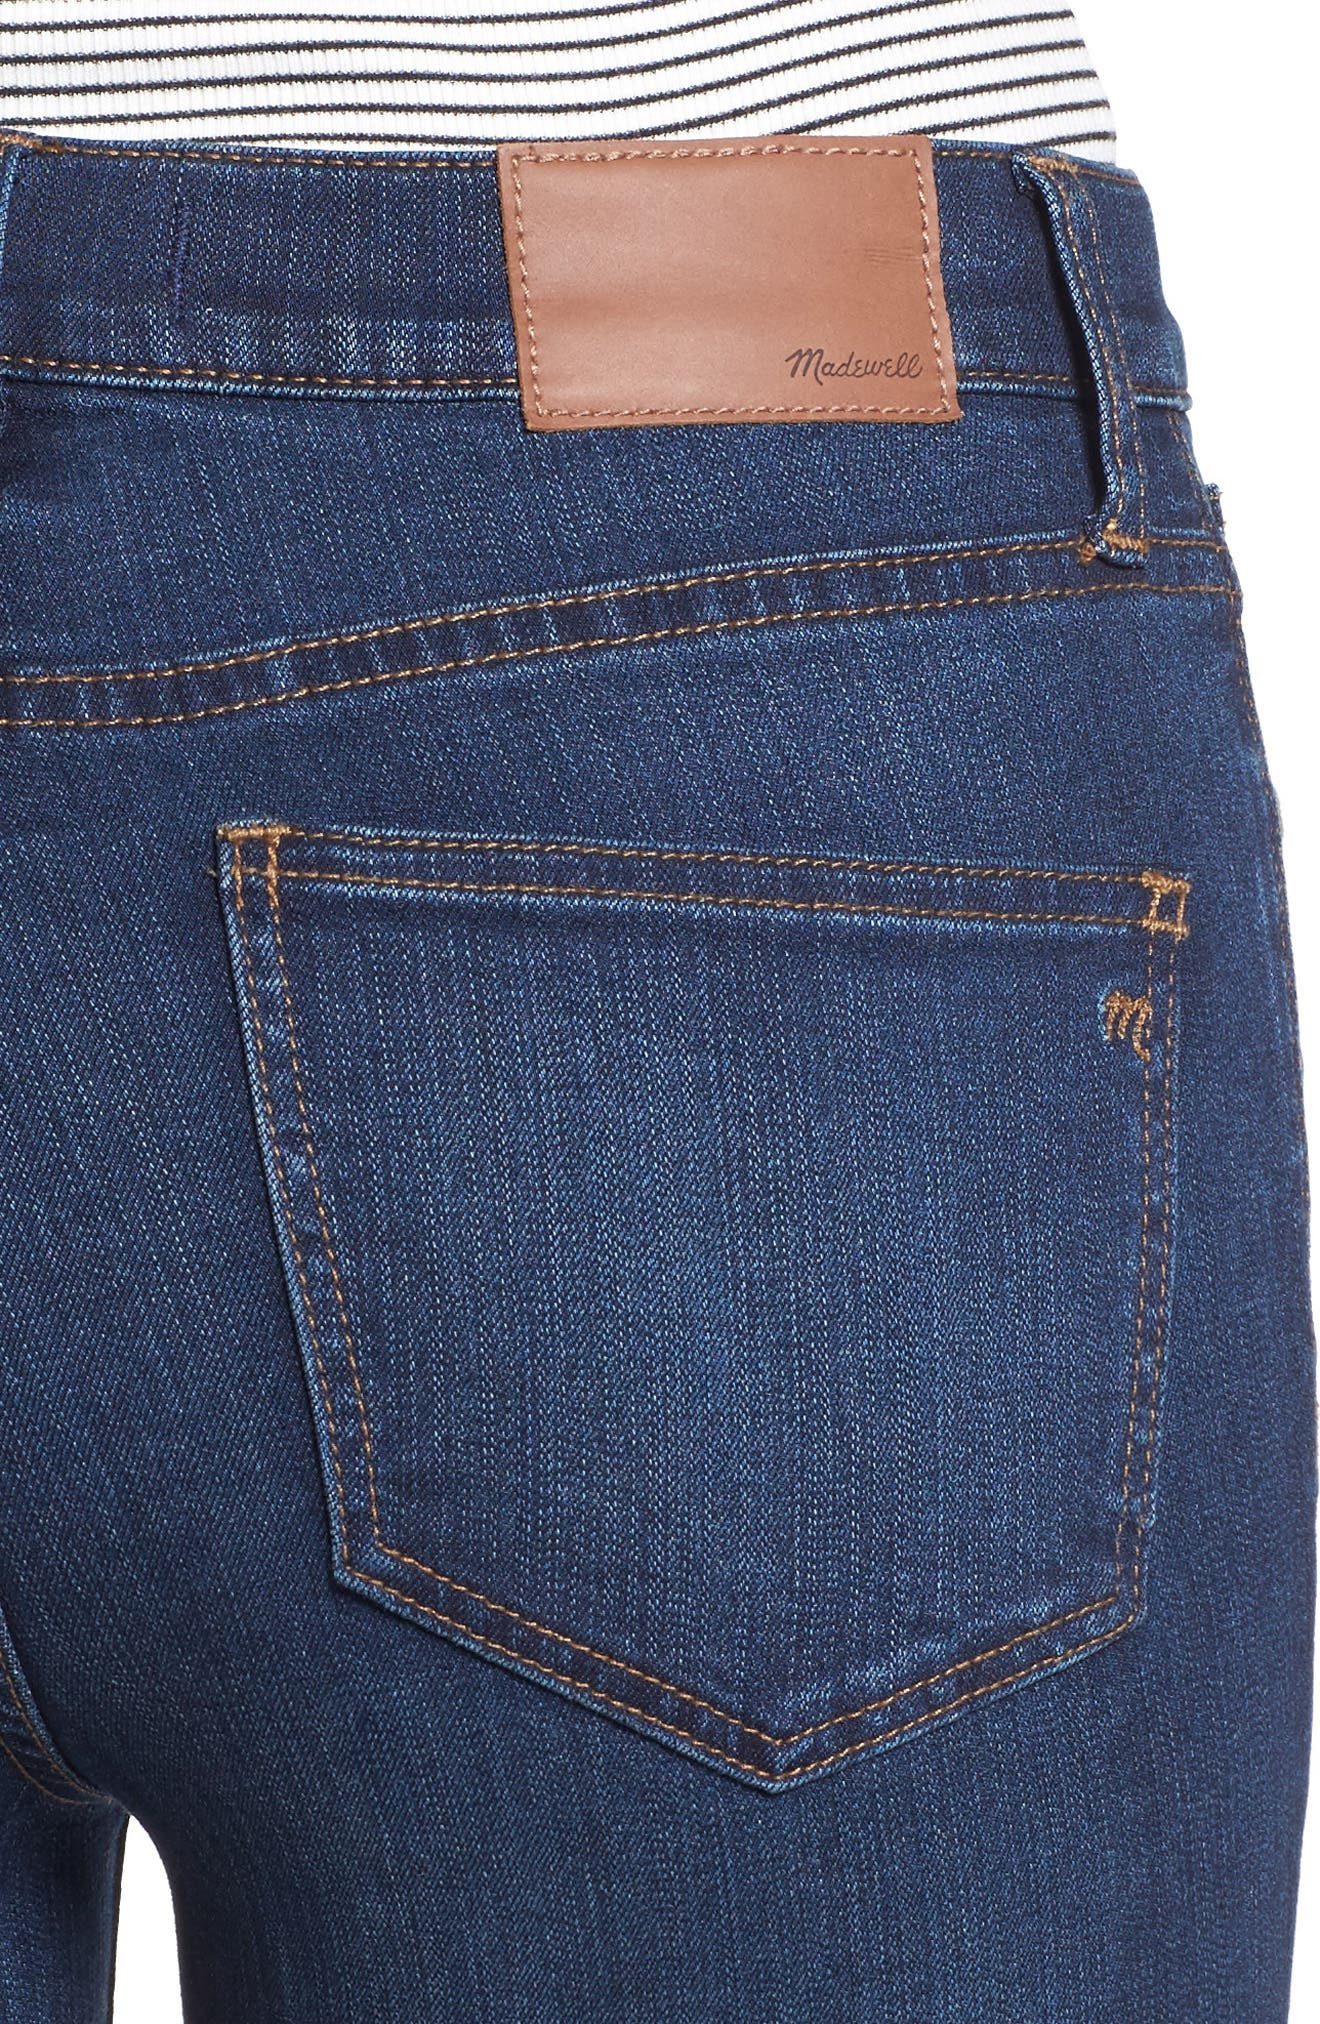 Roadtripper Jeans,                             Alternate thumbnail 4, color,                             416